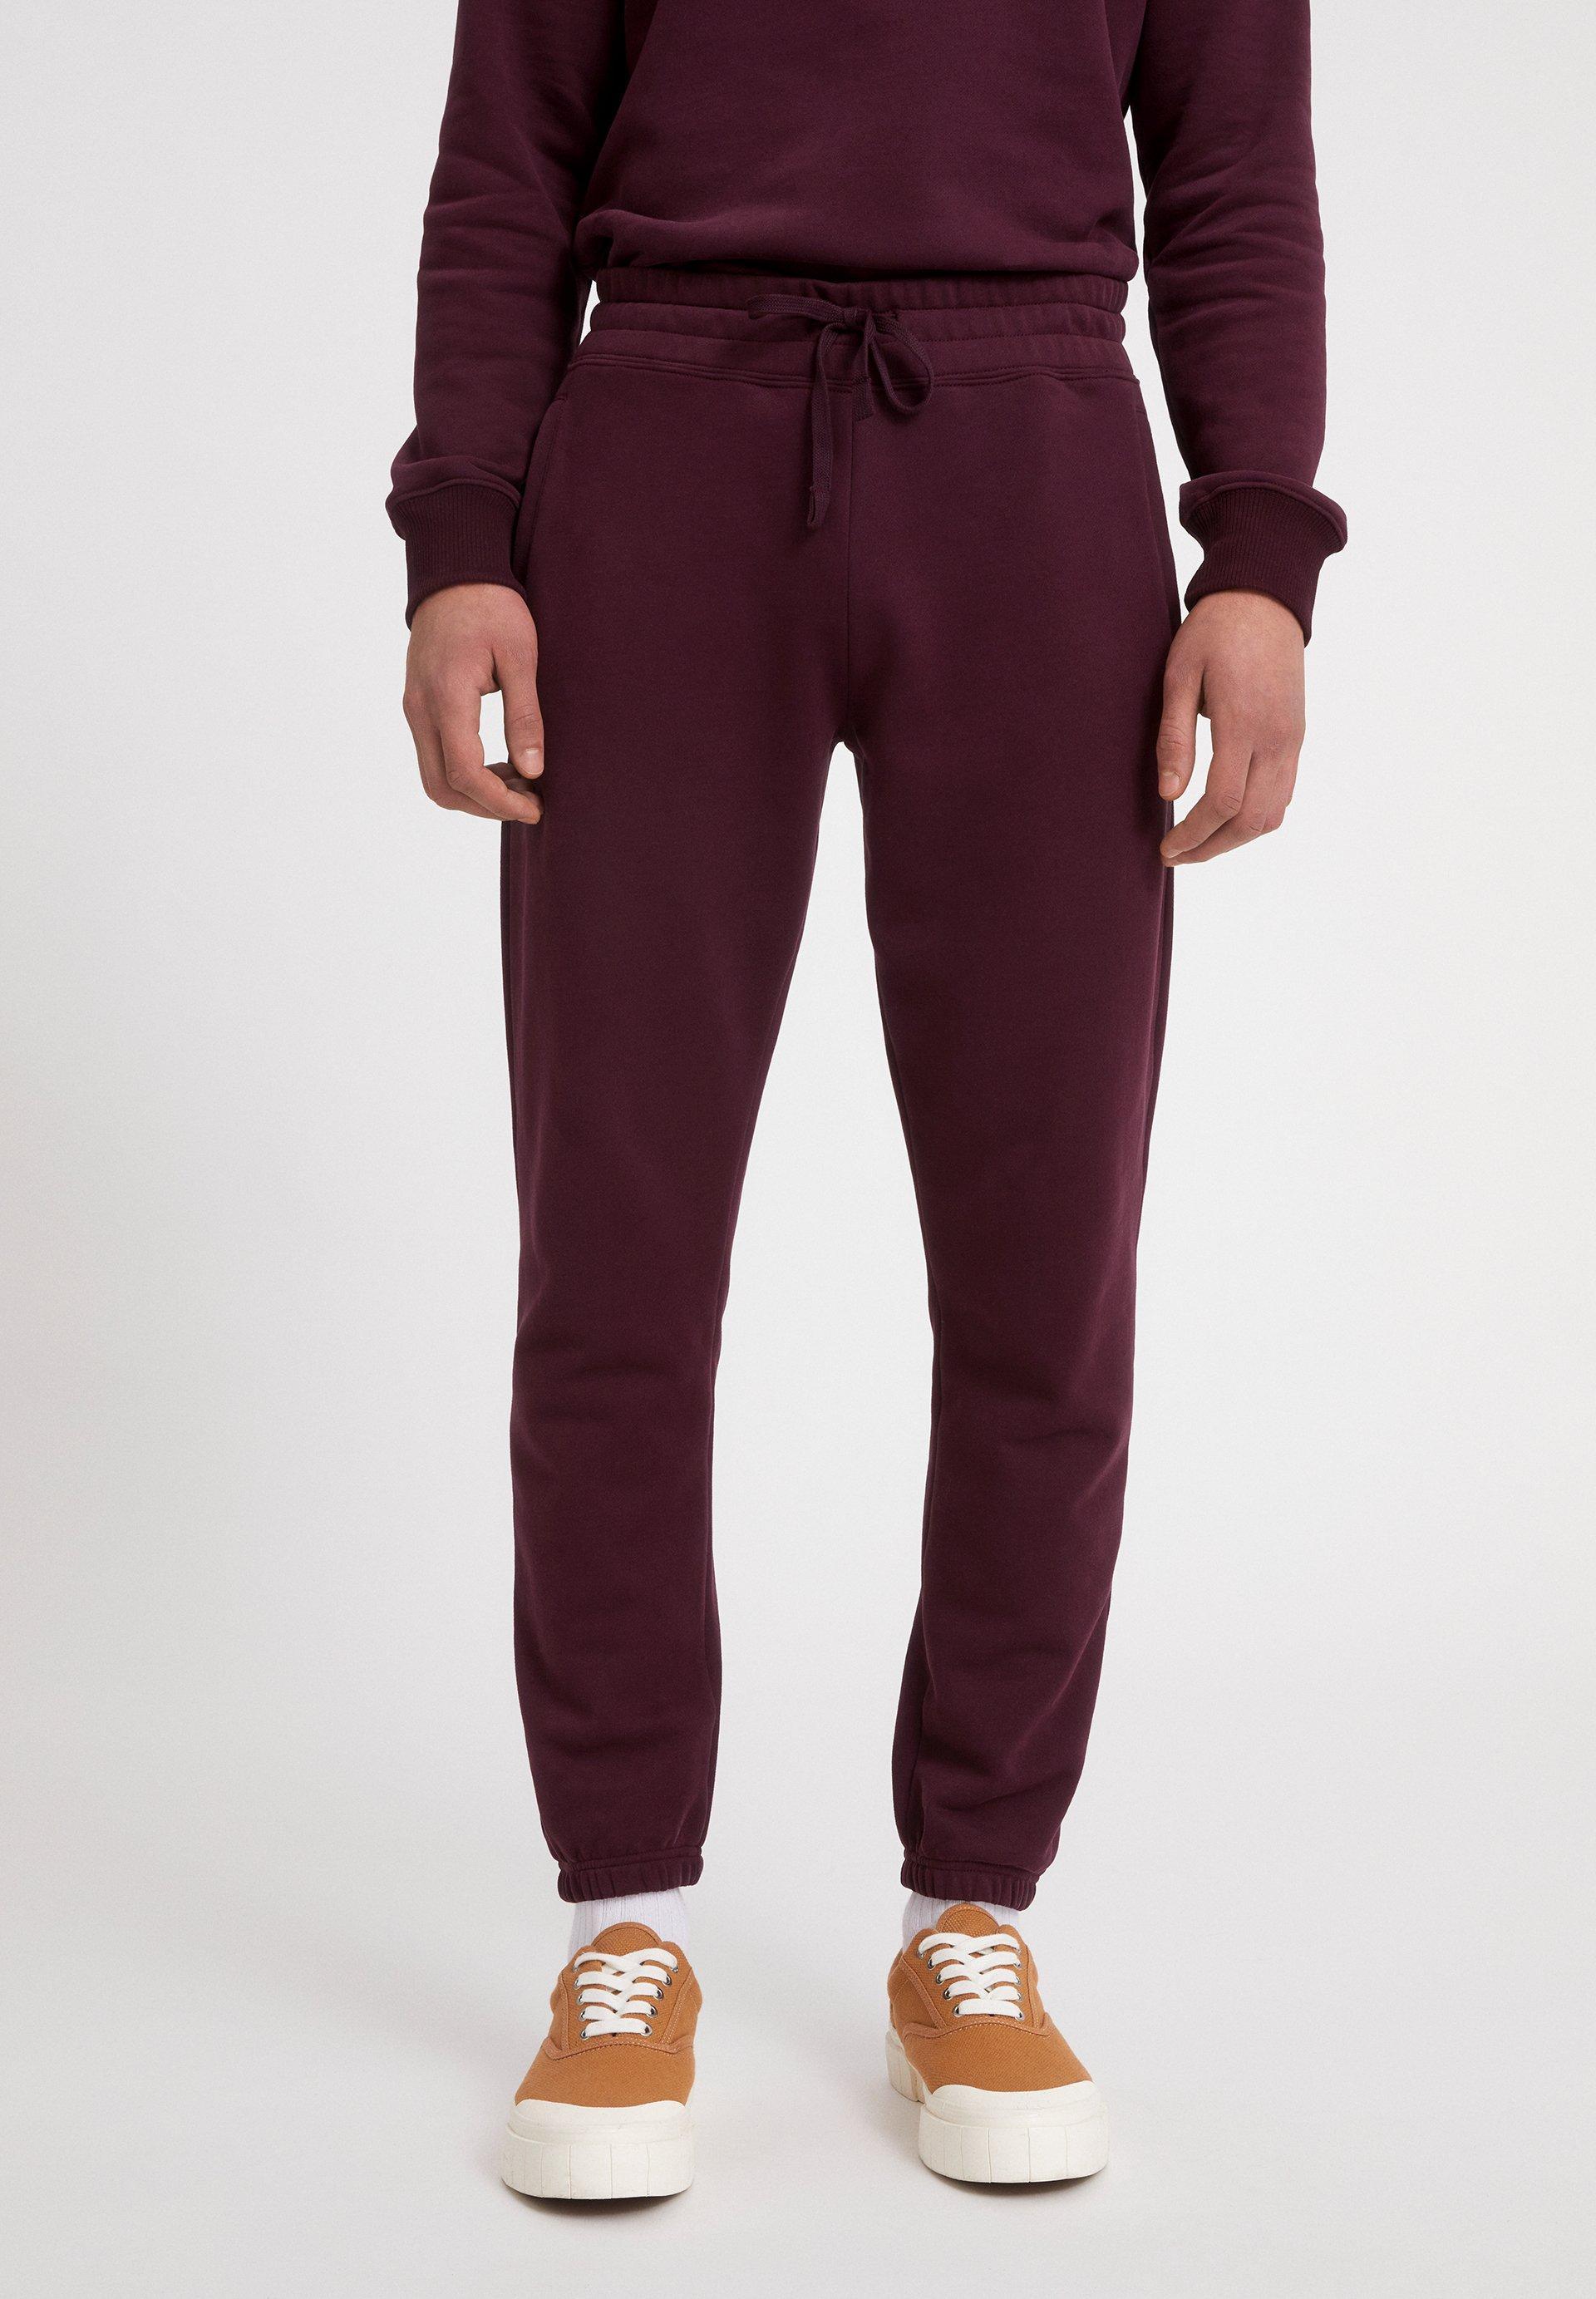 Homme AADAN COMFORT - Pantalon de survêtement